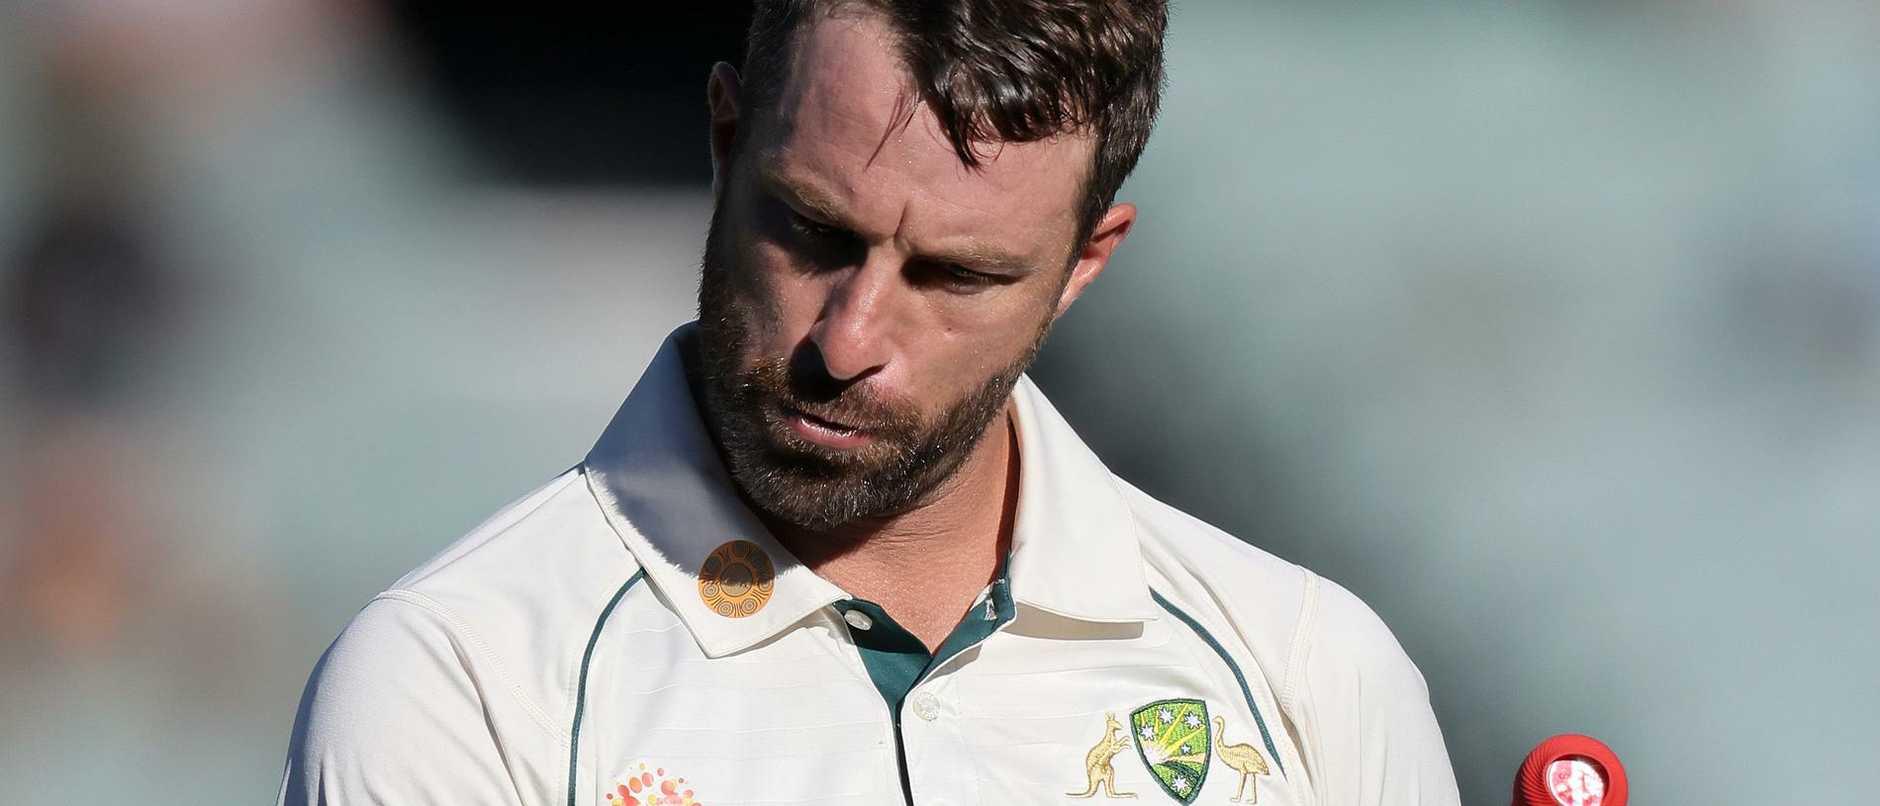 Australian cricket star Matthew Wade has 'signed his own death warrant'